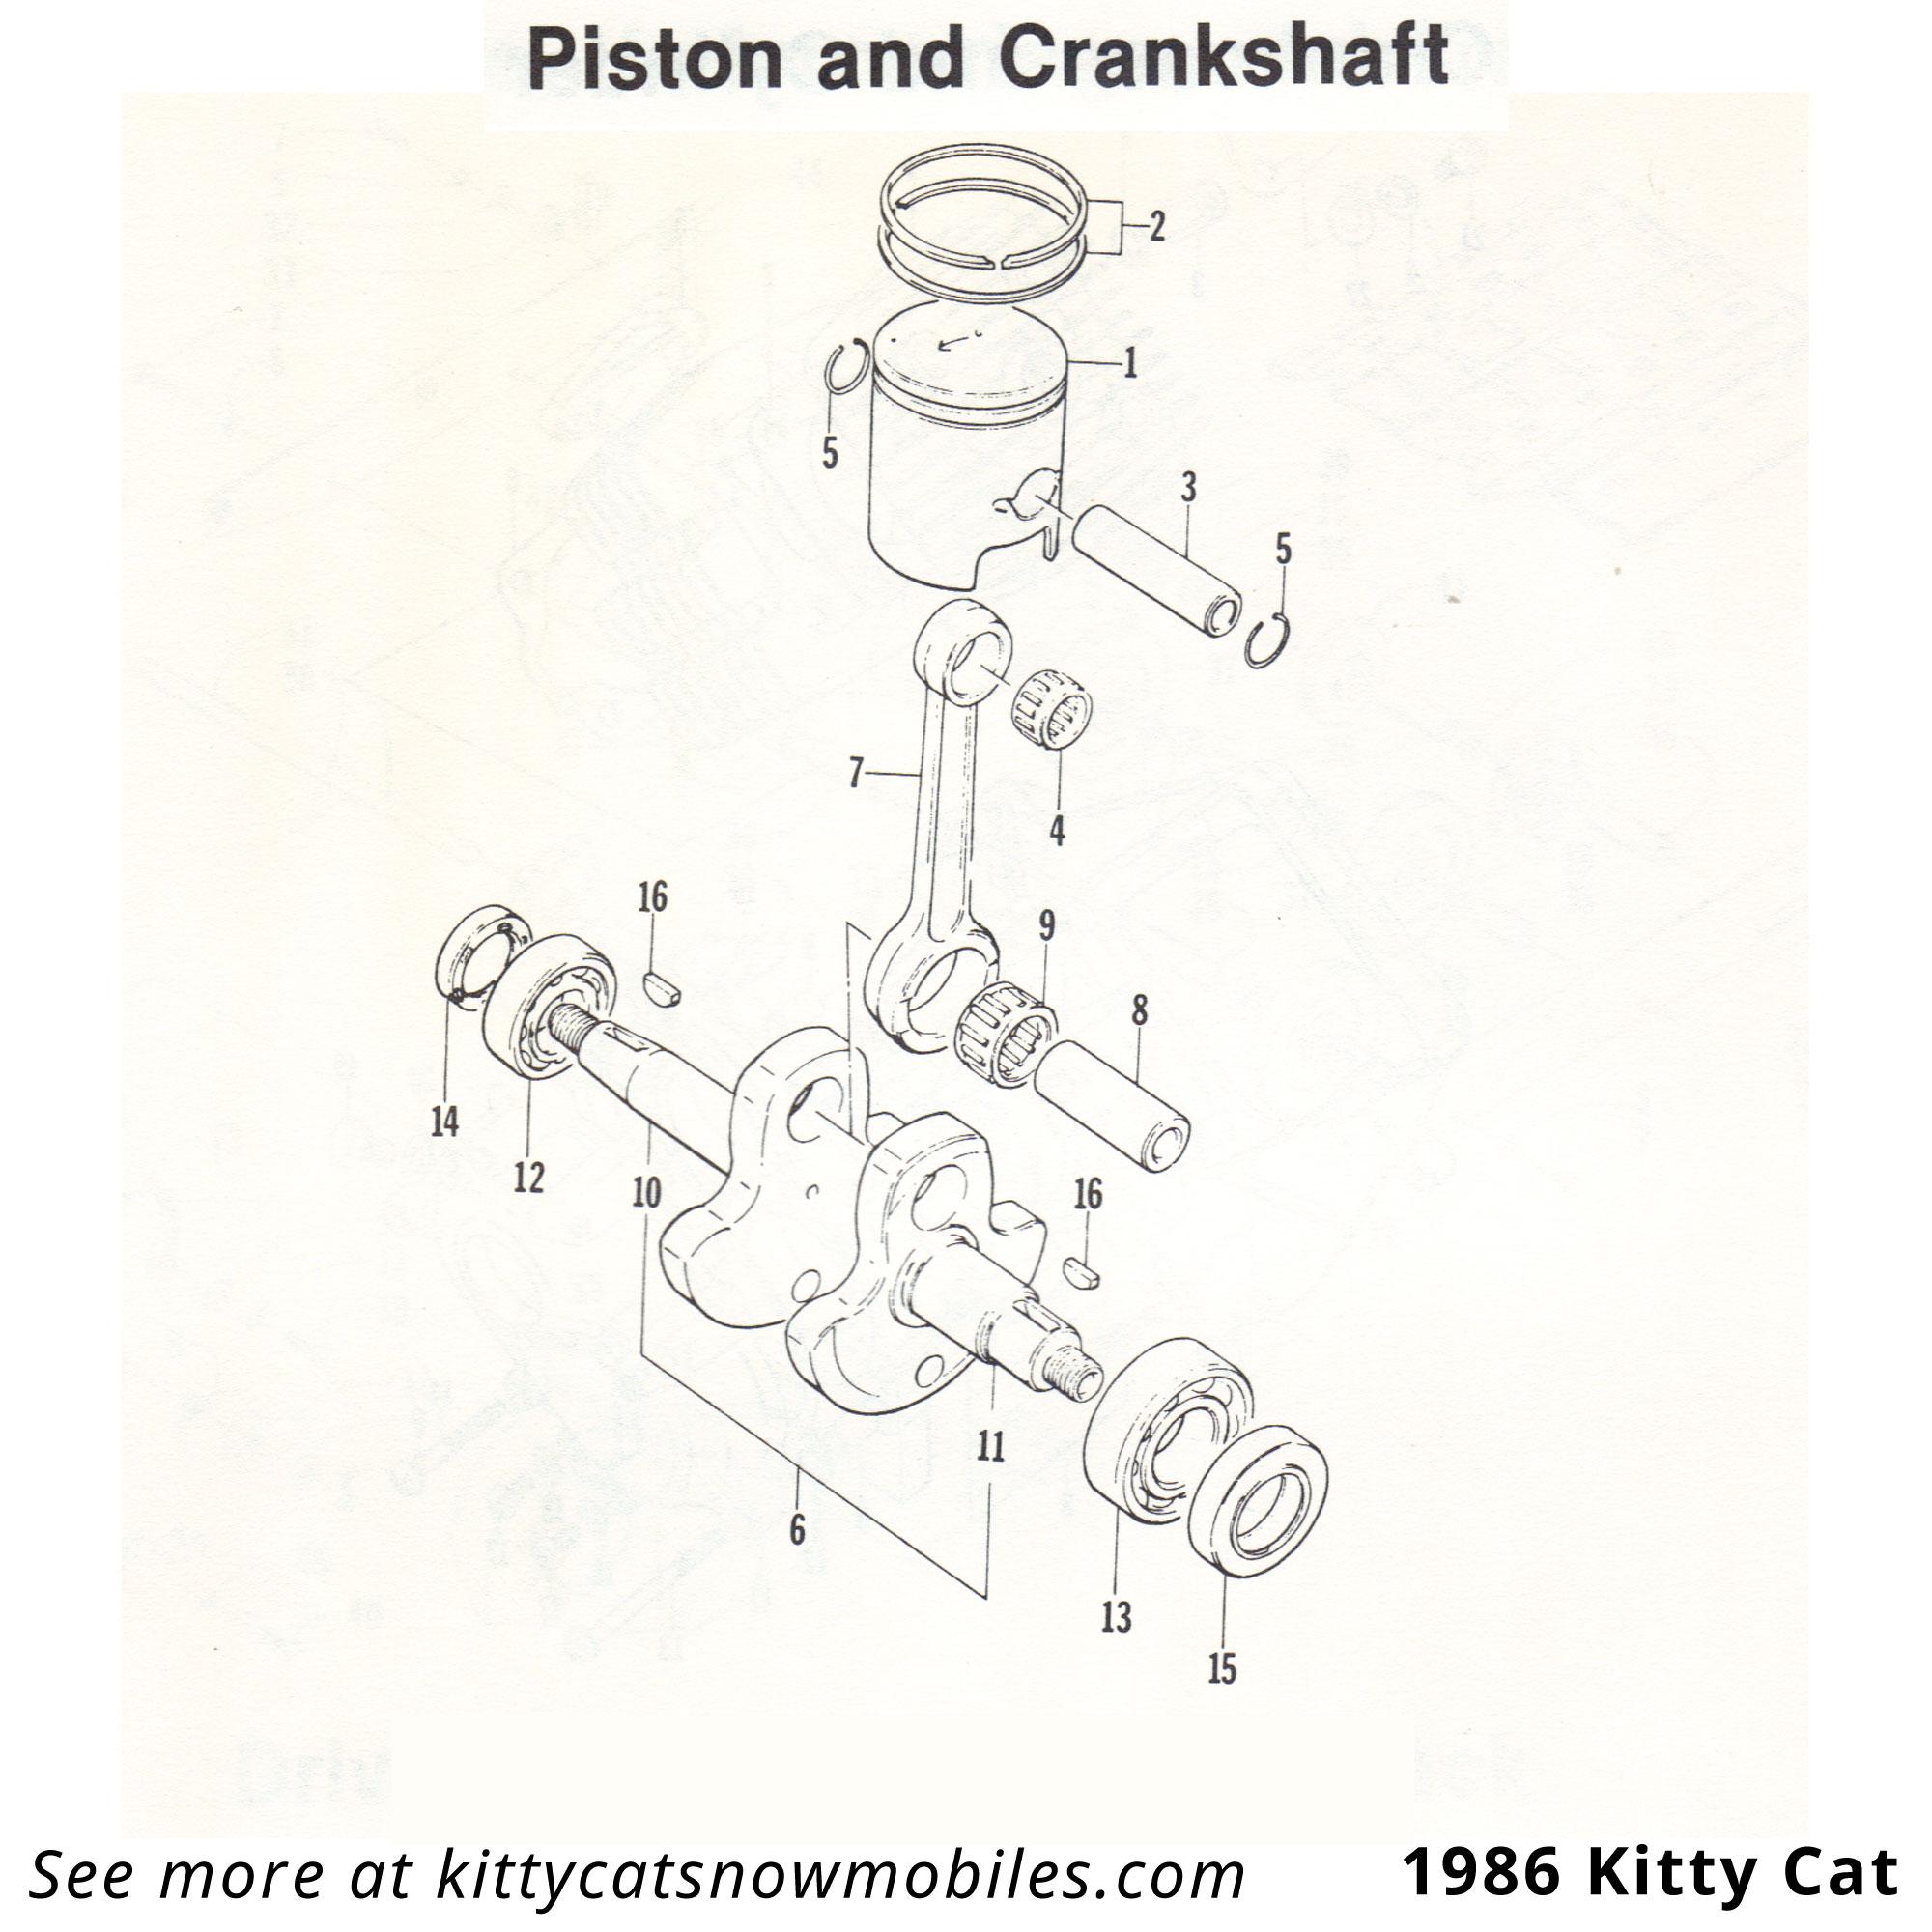 86 Piston and Crankshaft parts